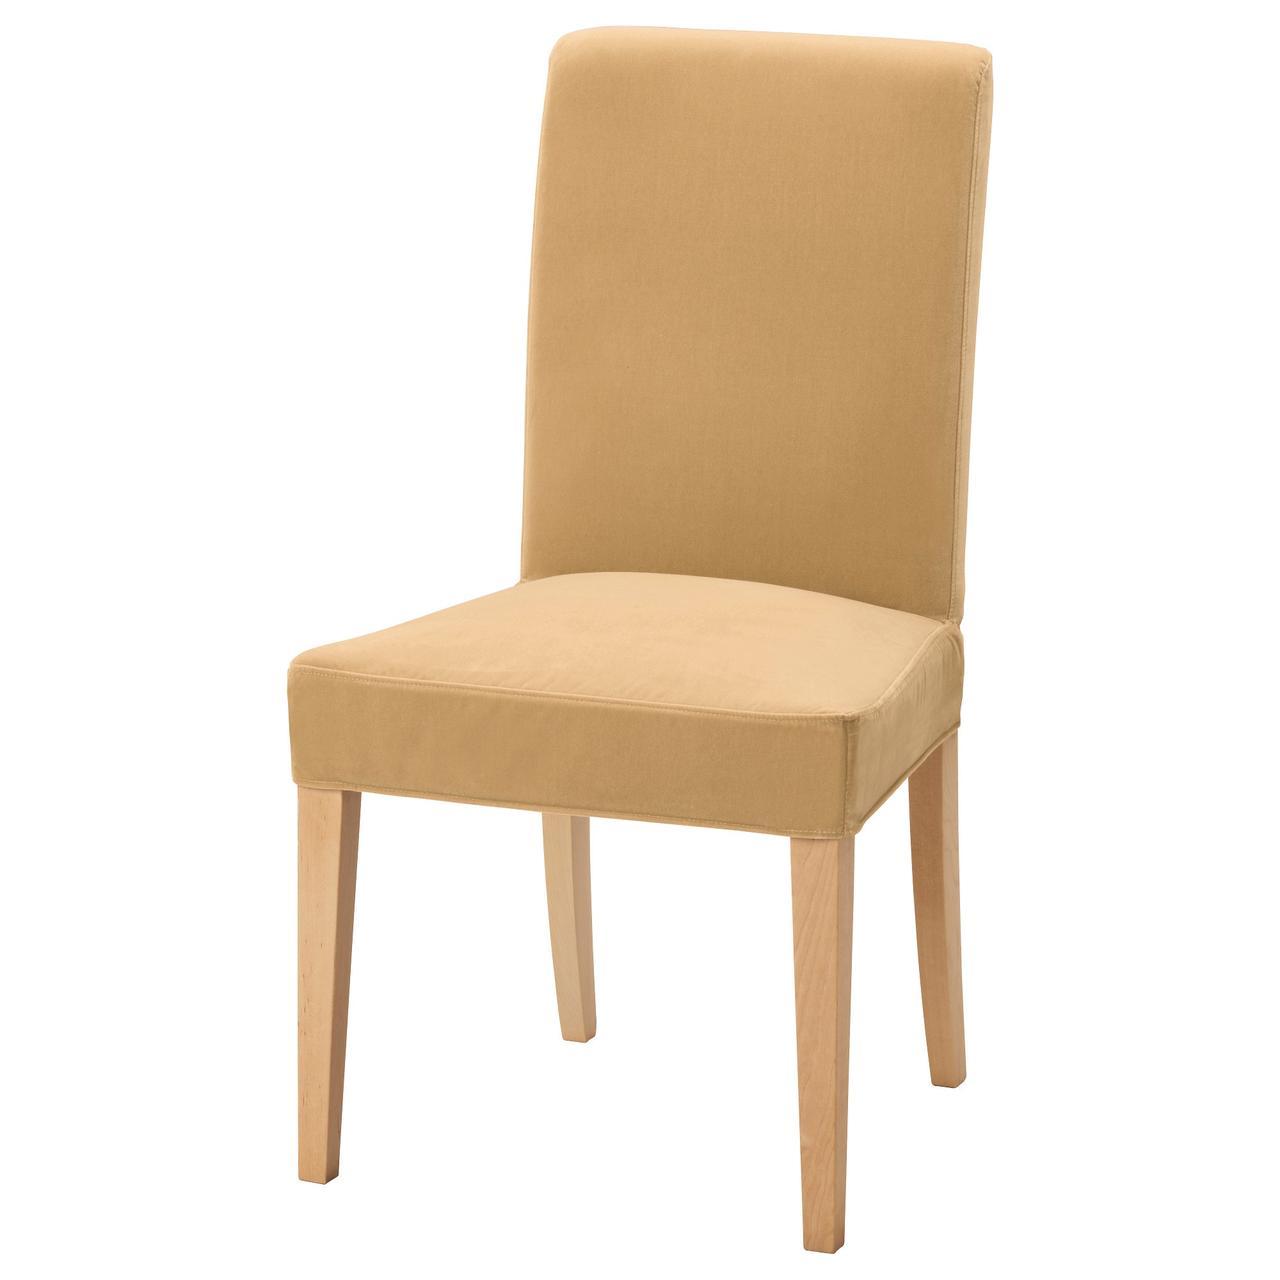 Кресло кухонное IKEA HENRIKSDAL Djuparp желто-бежевое 192.463.42